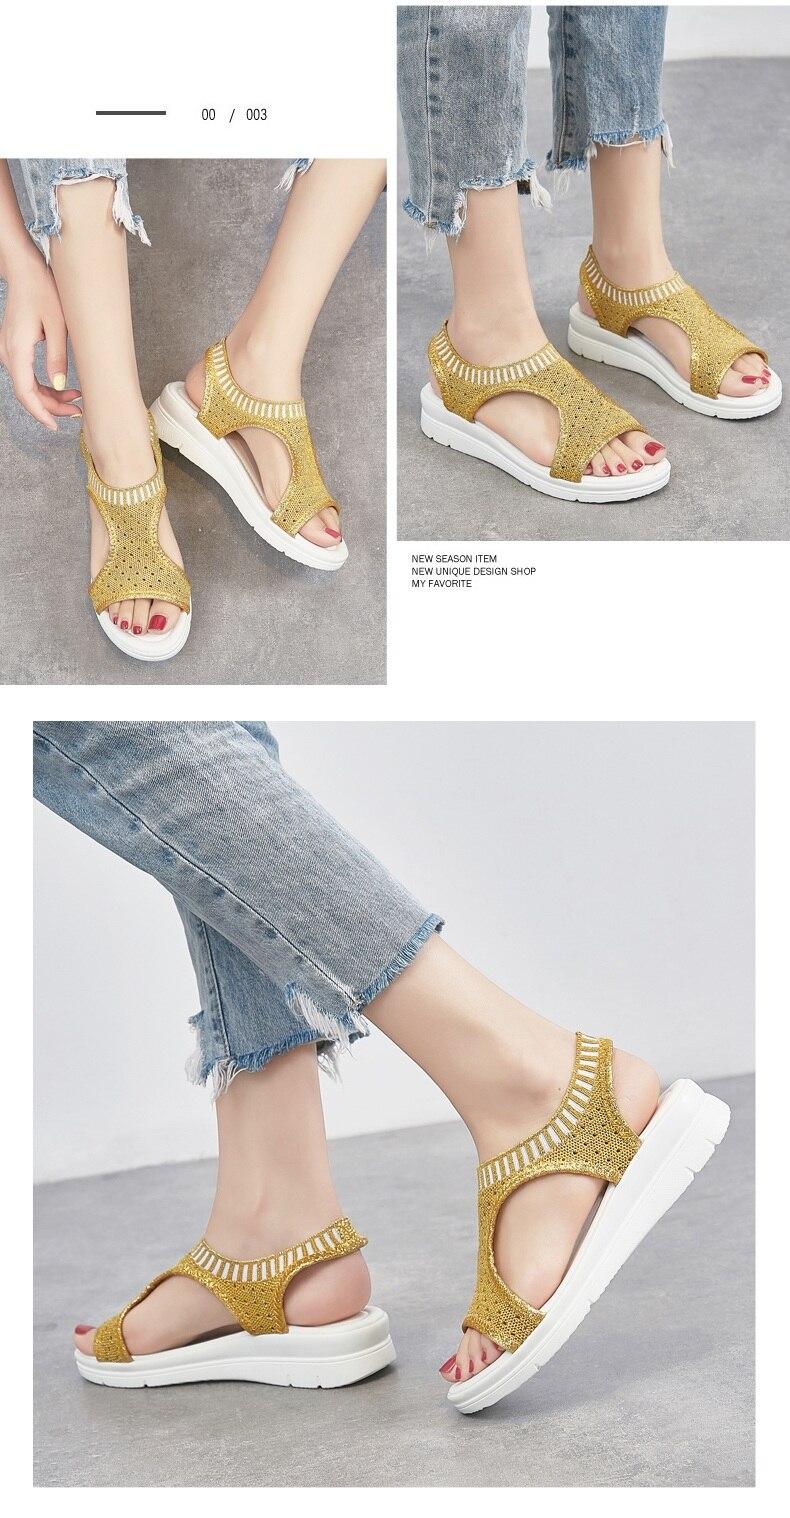 H2e76a4ed97d54a4fb92d17e6a64f001cS WDZKN 2019 Sandals Women Summer Shoes Peep Toe Casual Flat Sandals Ladies Breathable Air Mesh Women Platform Sandals Sandalias